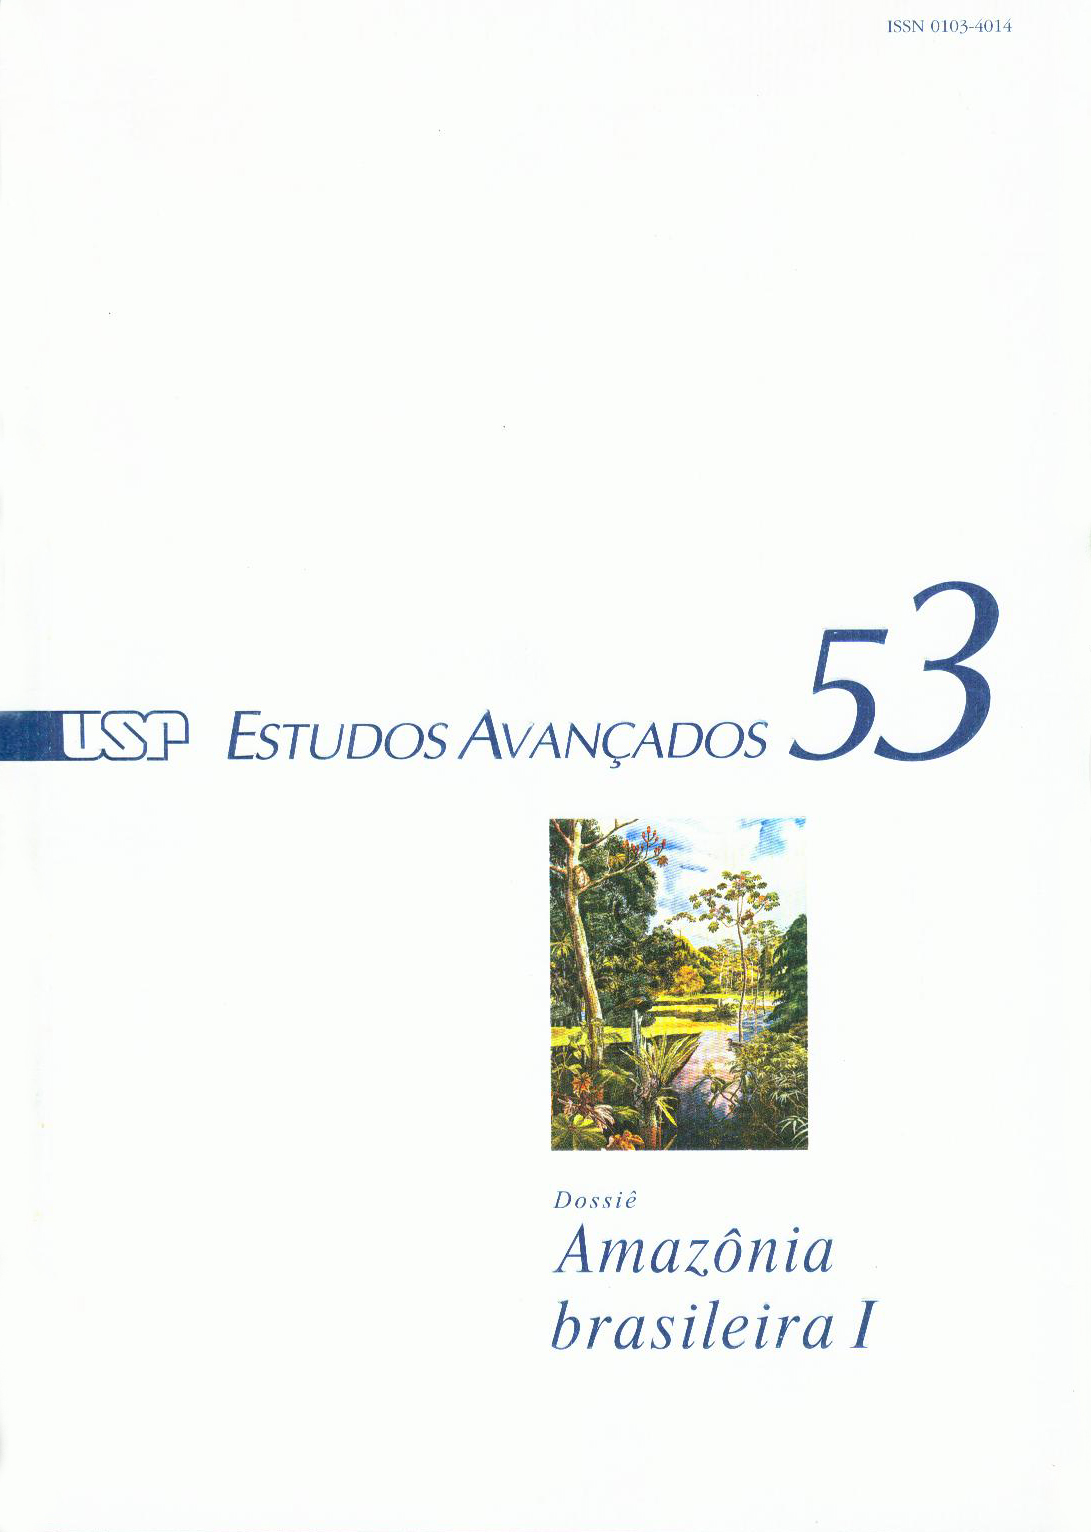 Visualizar v. 19 n. 53 (2005)